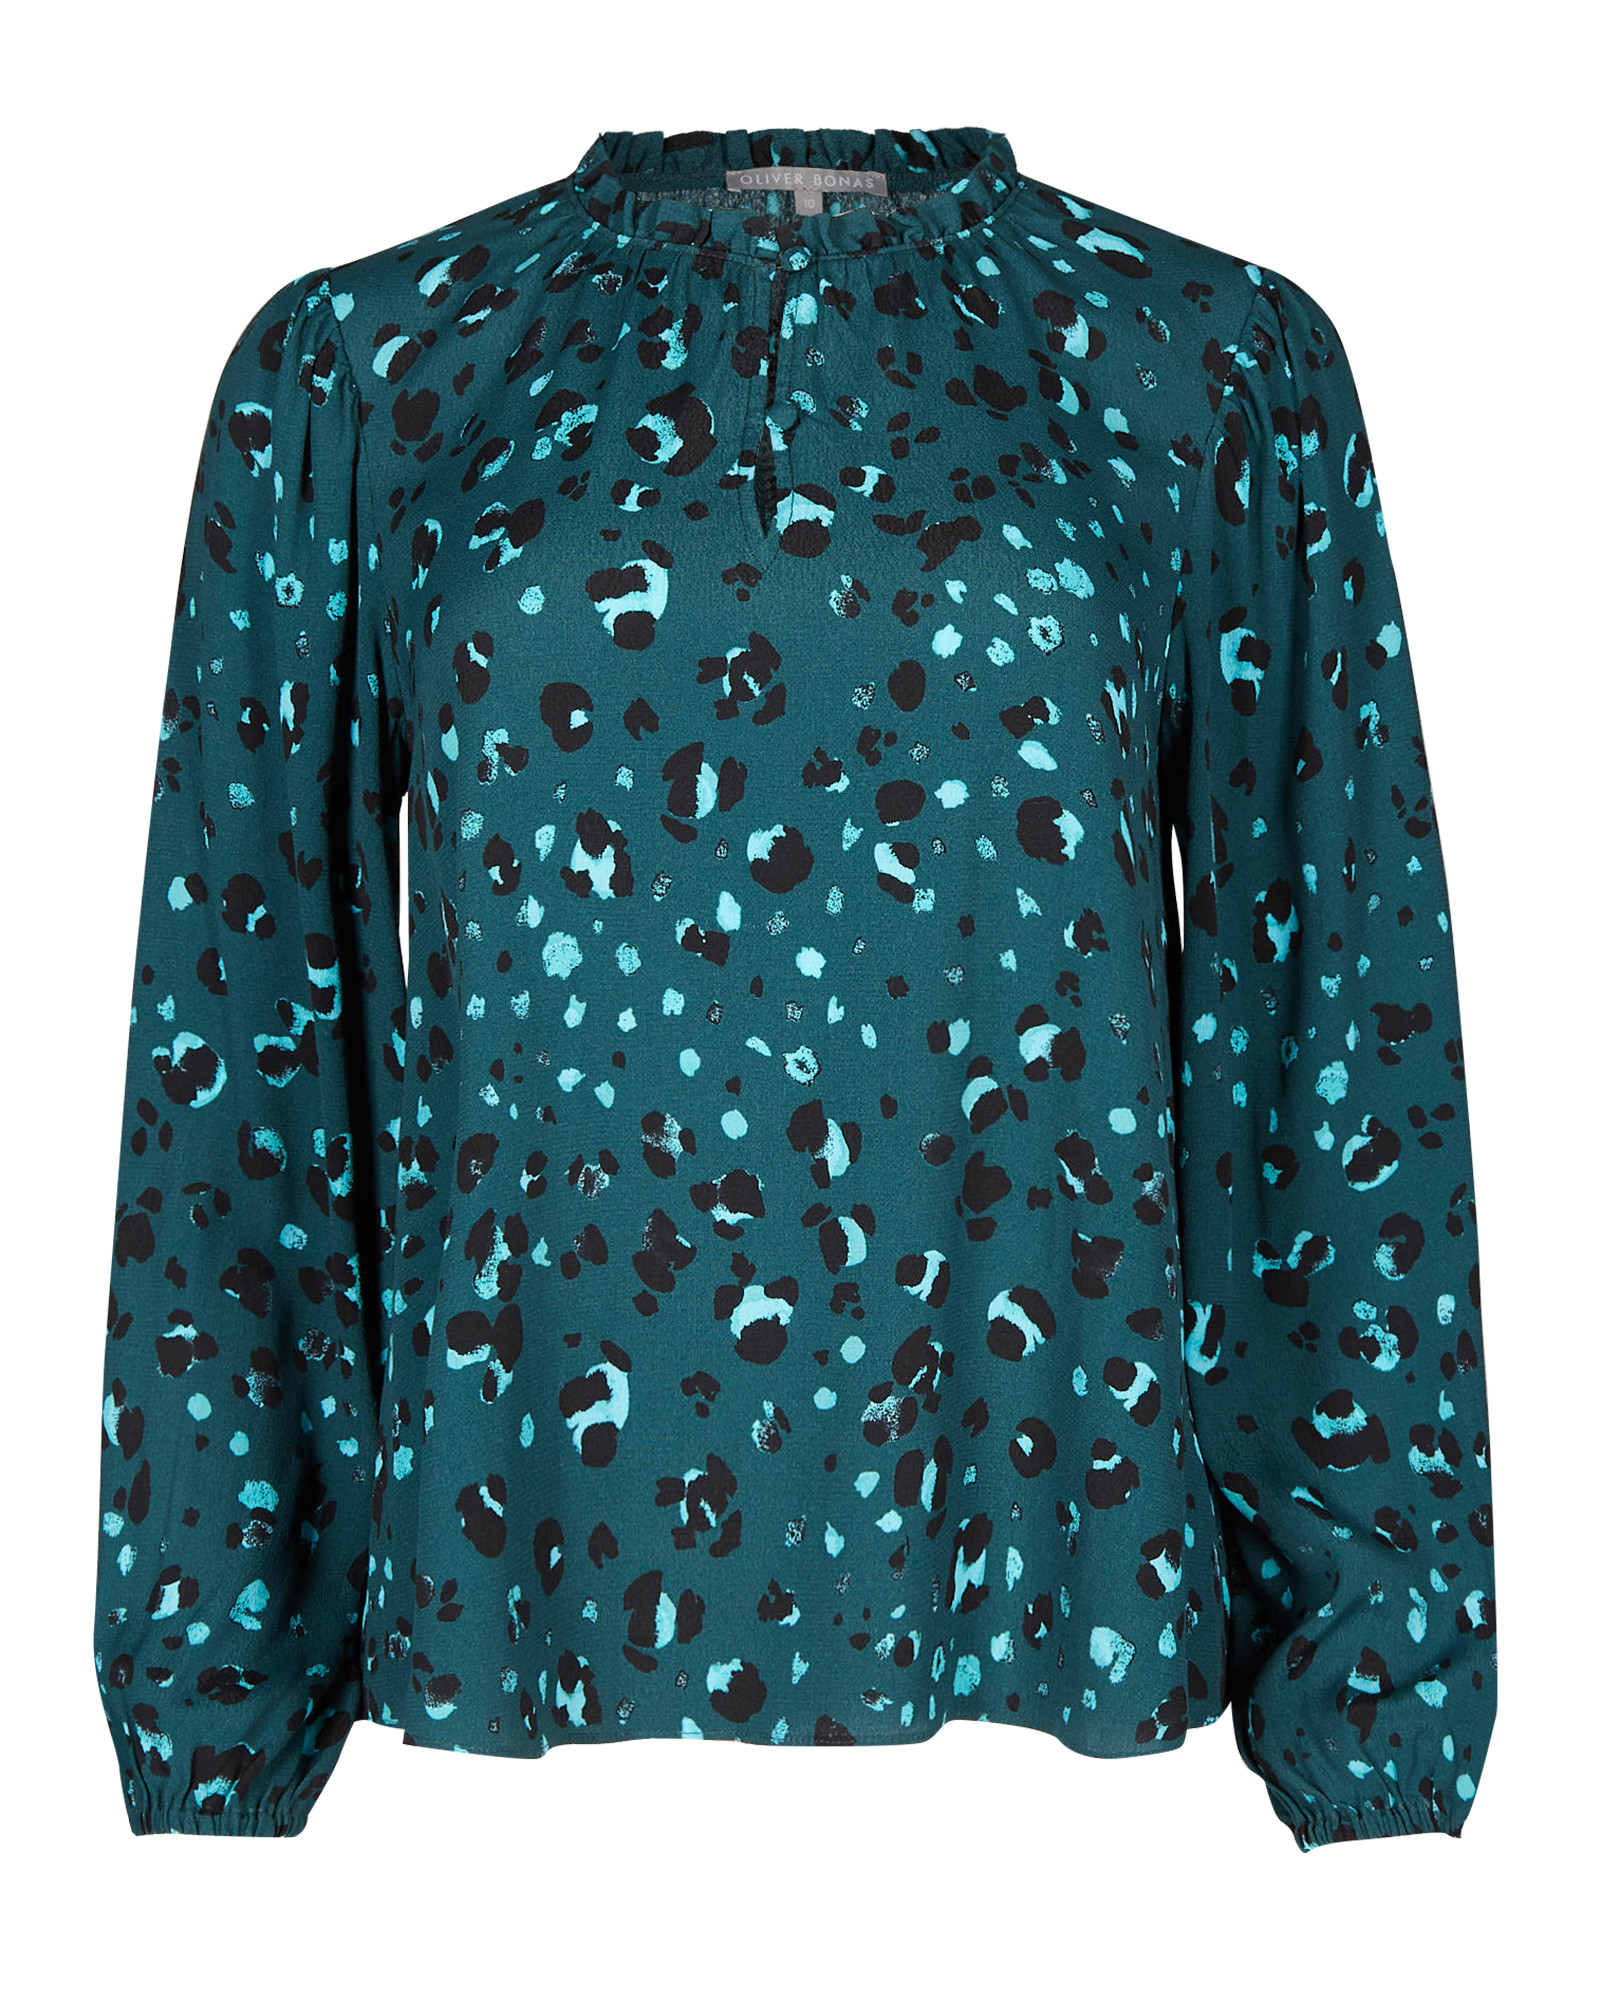 Snow Leopard Print Teal Blue Long Sleeve Top